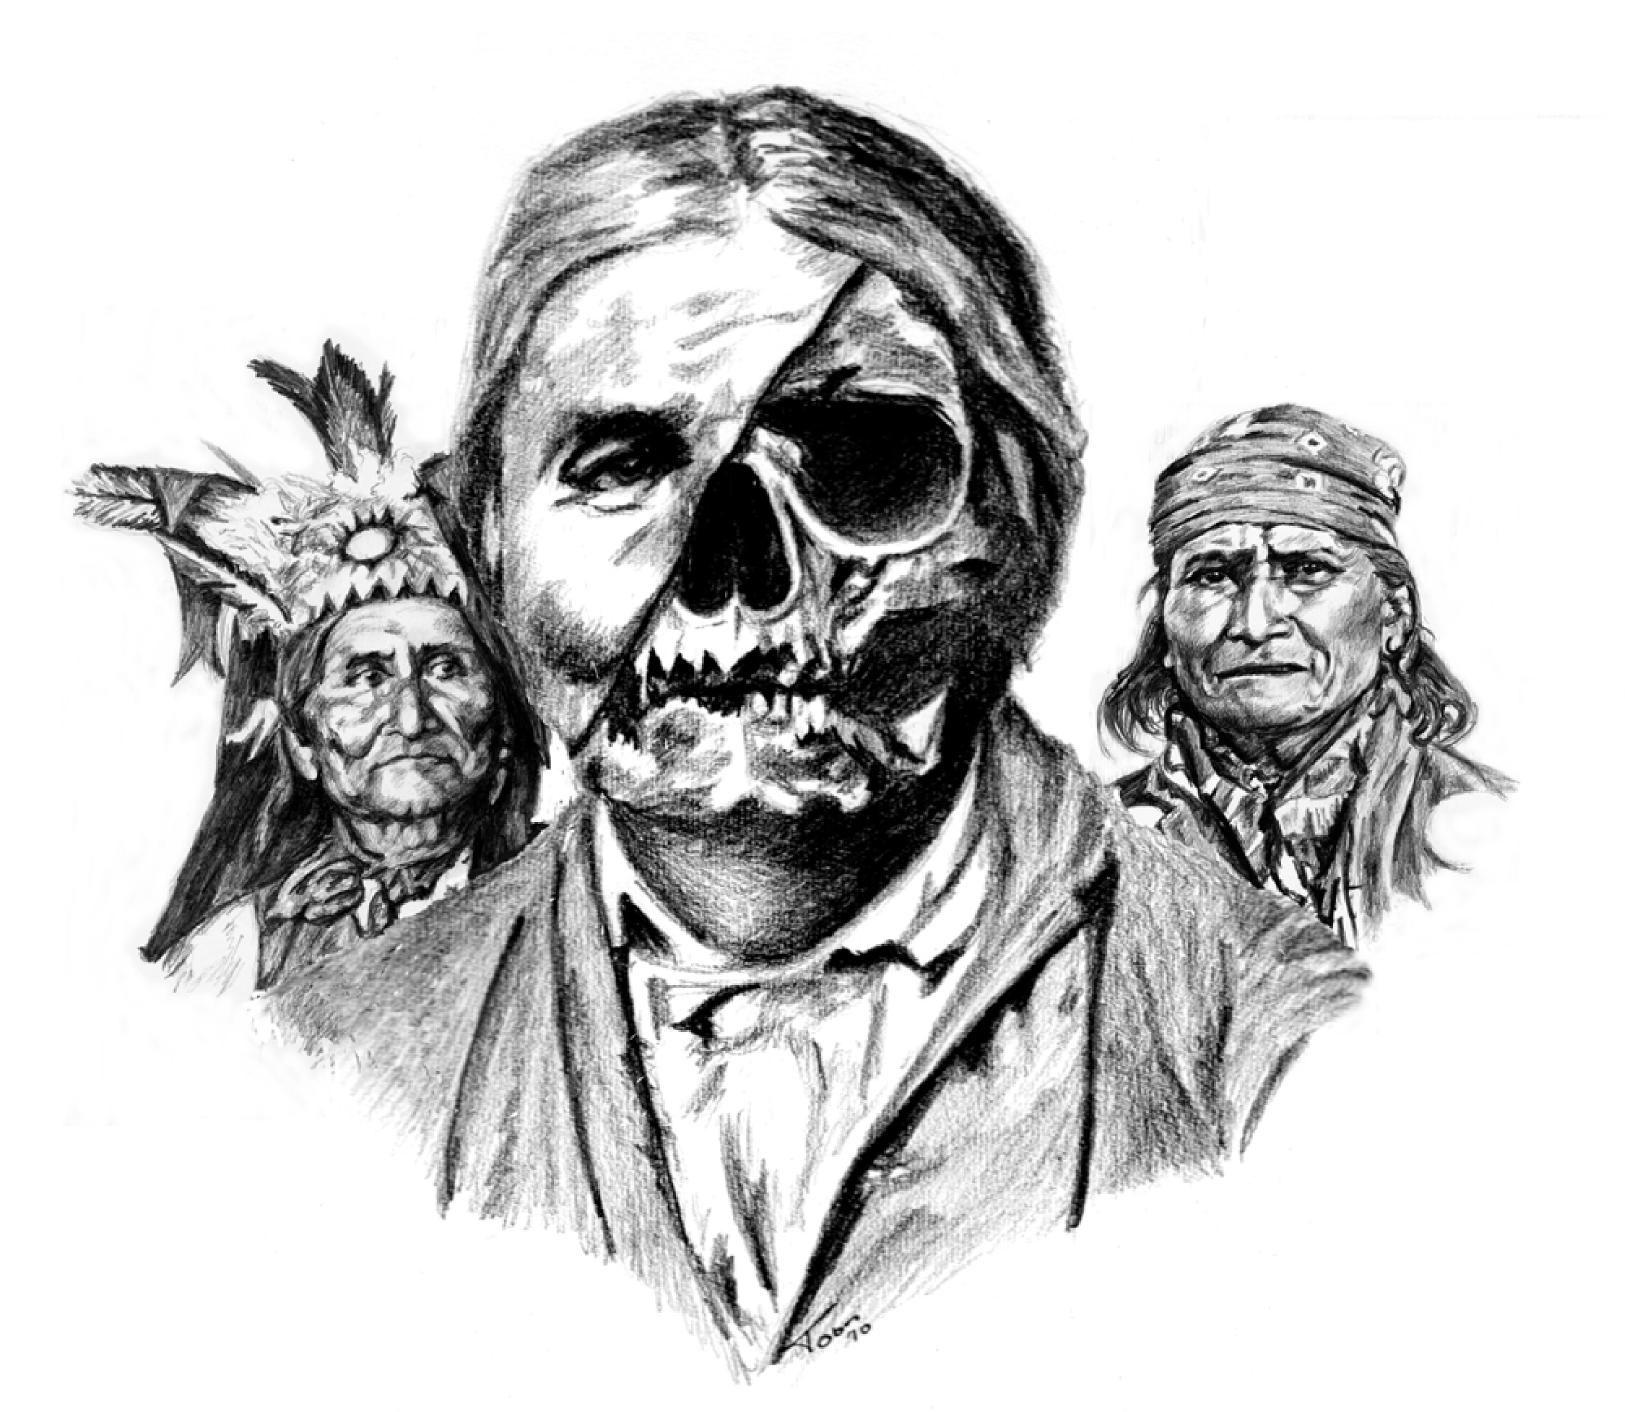 geronimo skull - Google Search